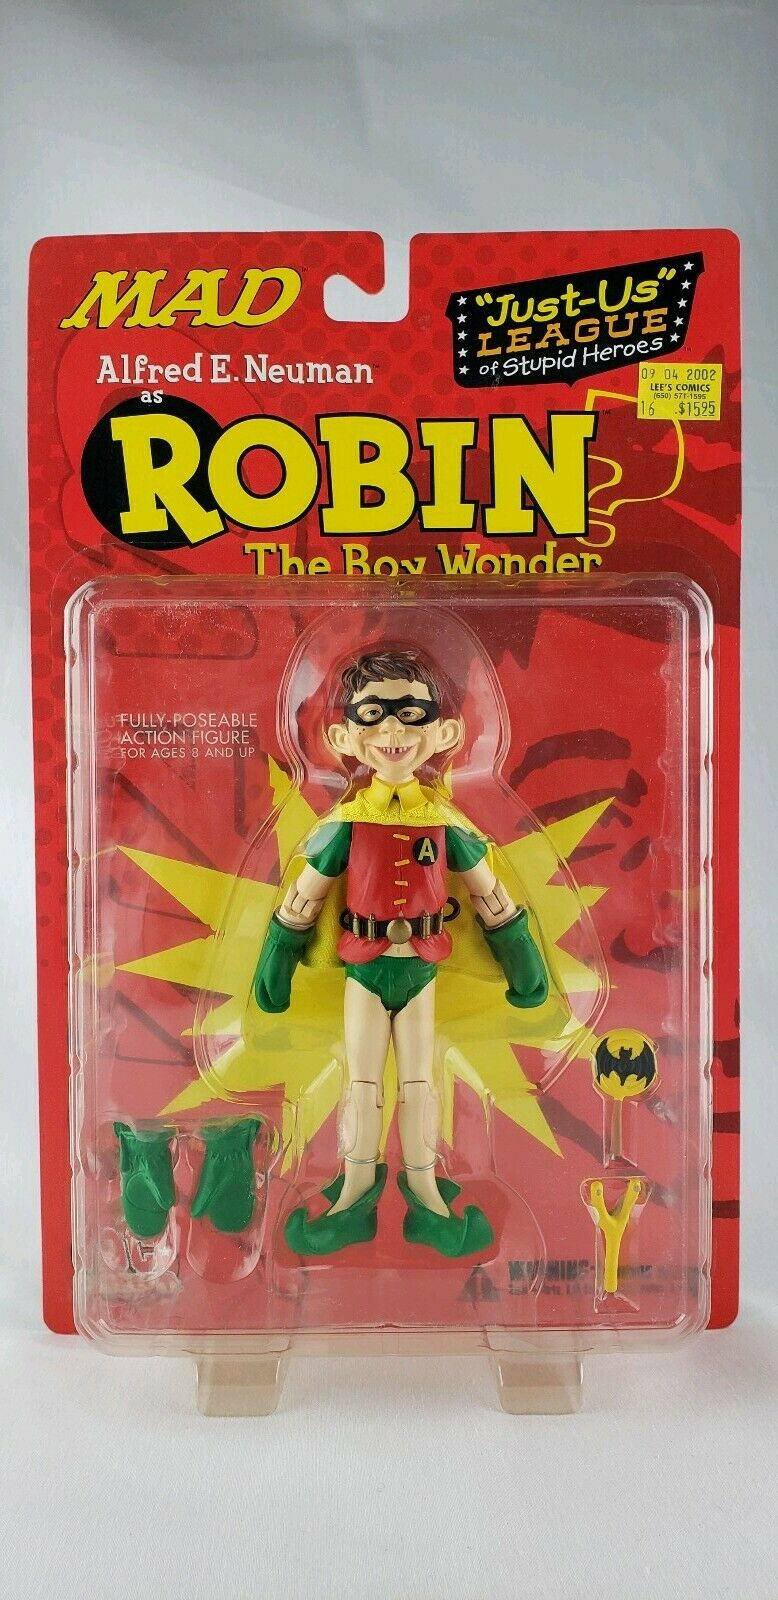 MAD Alfrojo E. Neuman Action Figure Robin Boy Wonder Just Us League 6 DC Direct